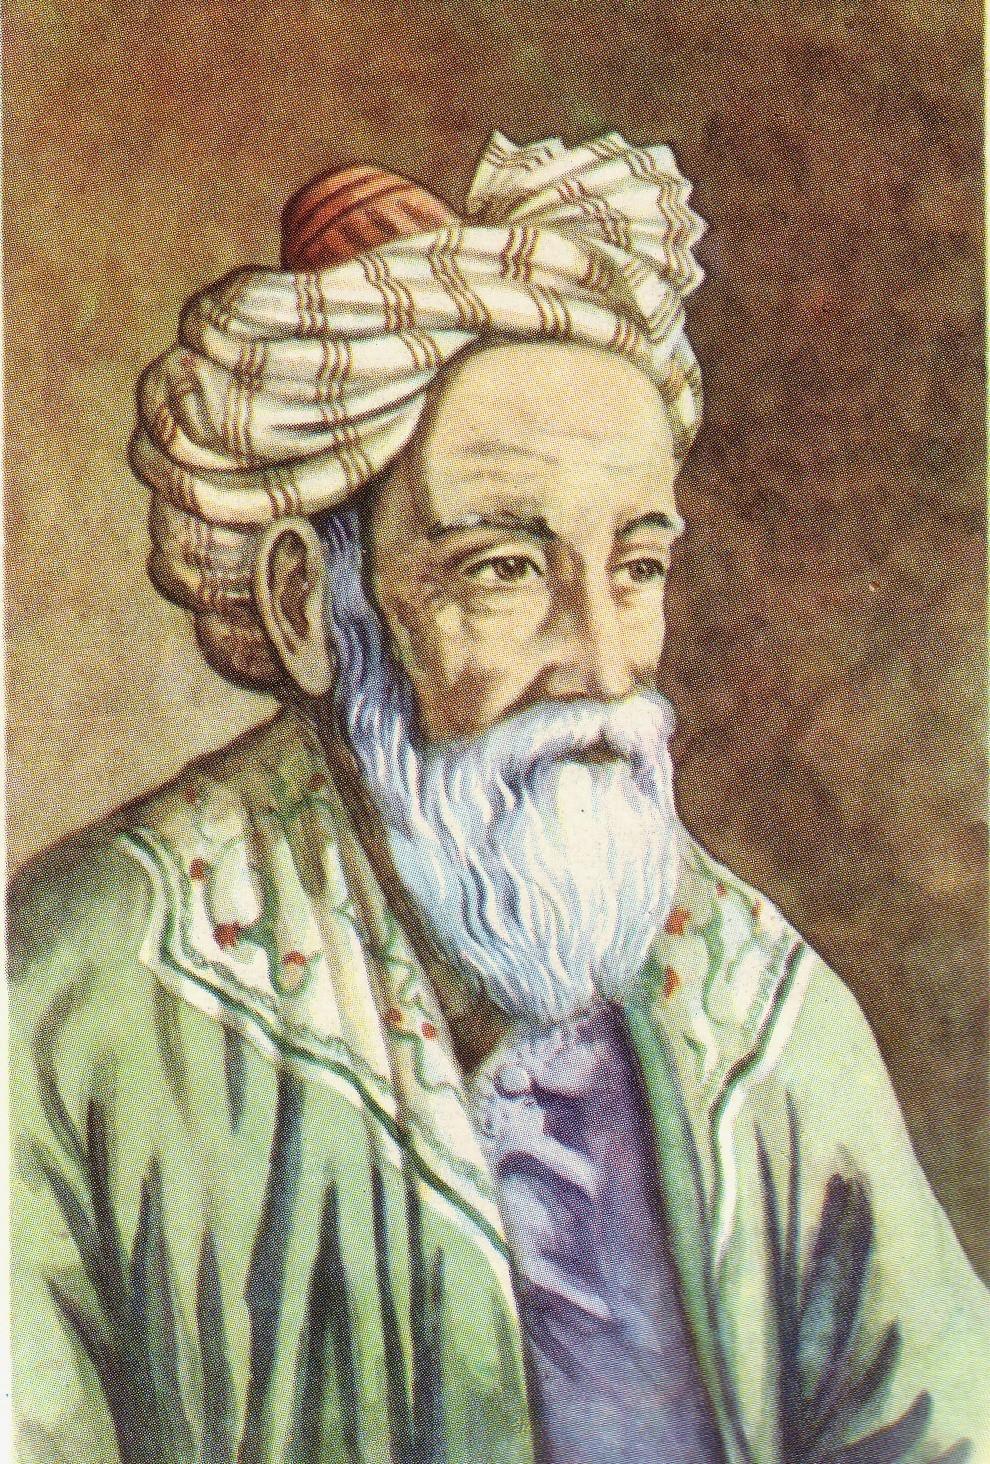 Omar (Омар) Khayyam (Хайям) عمر خیام